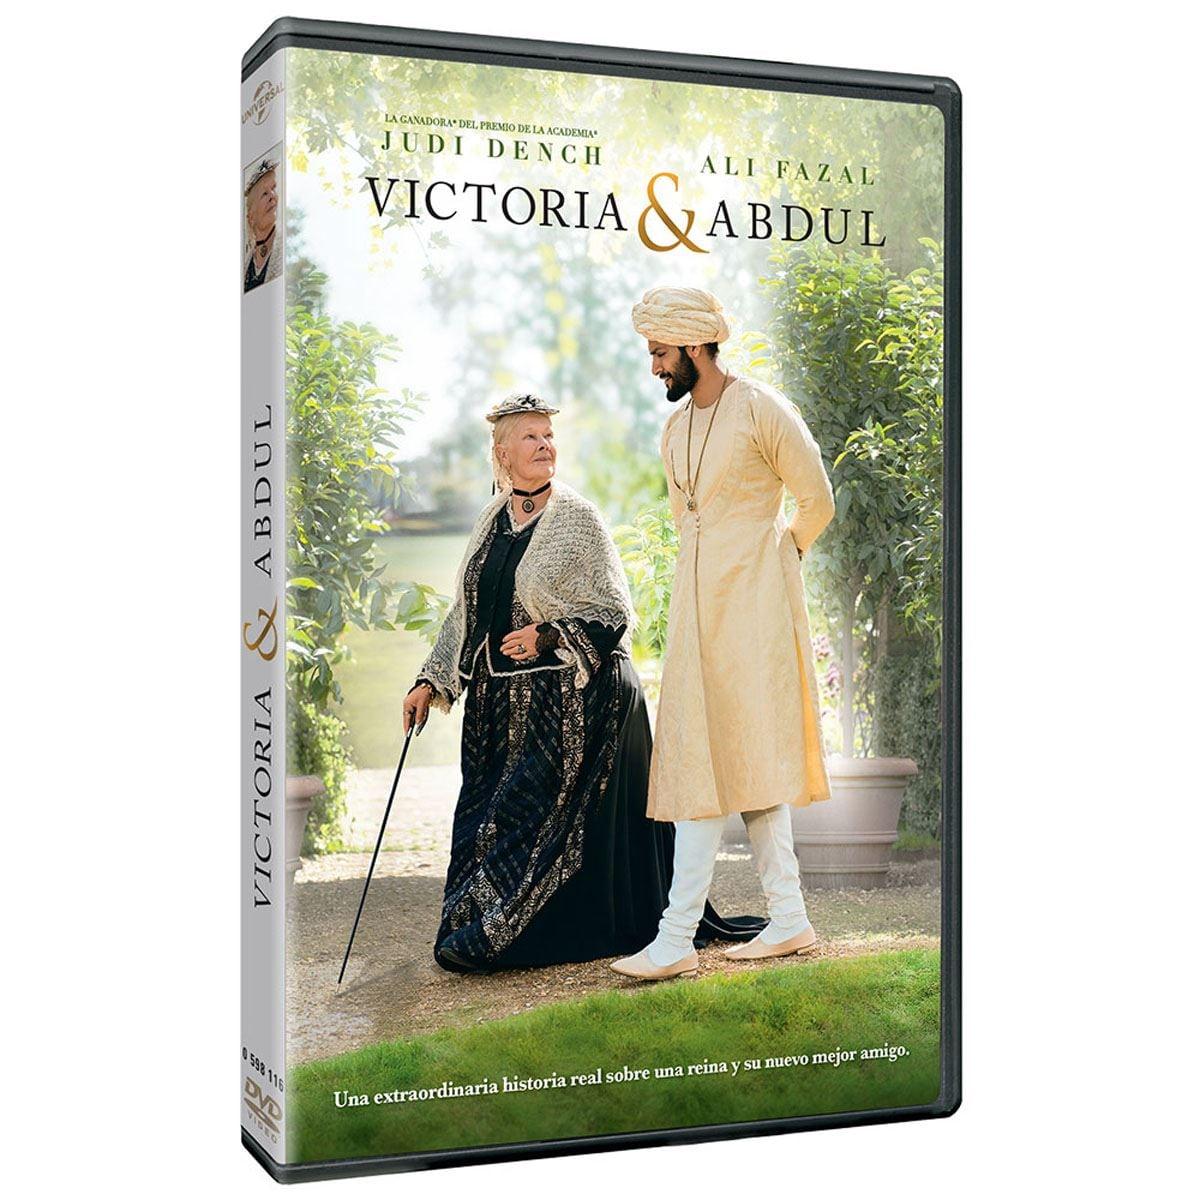 DVD Victoria y Adbul